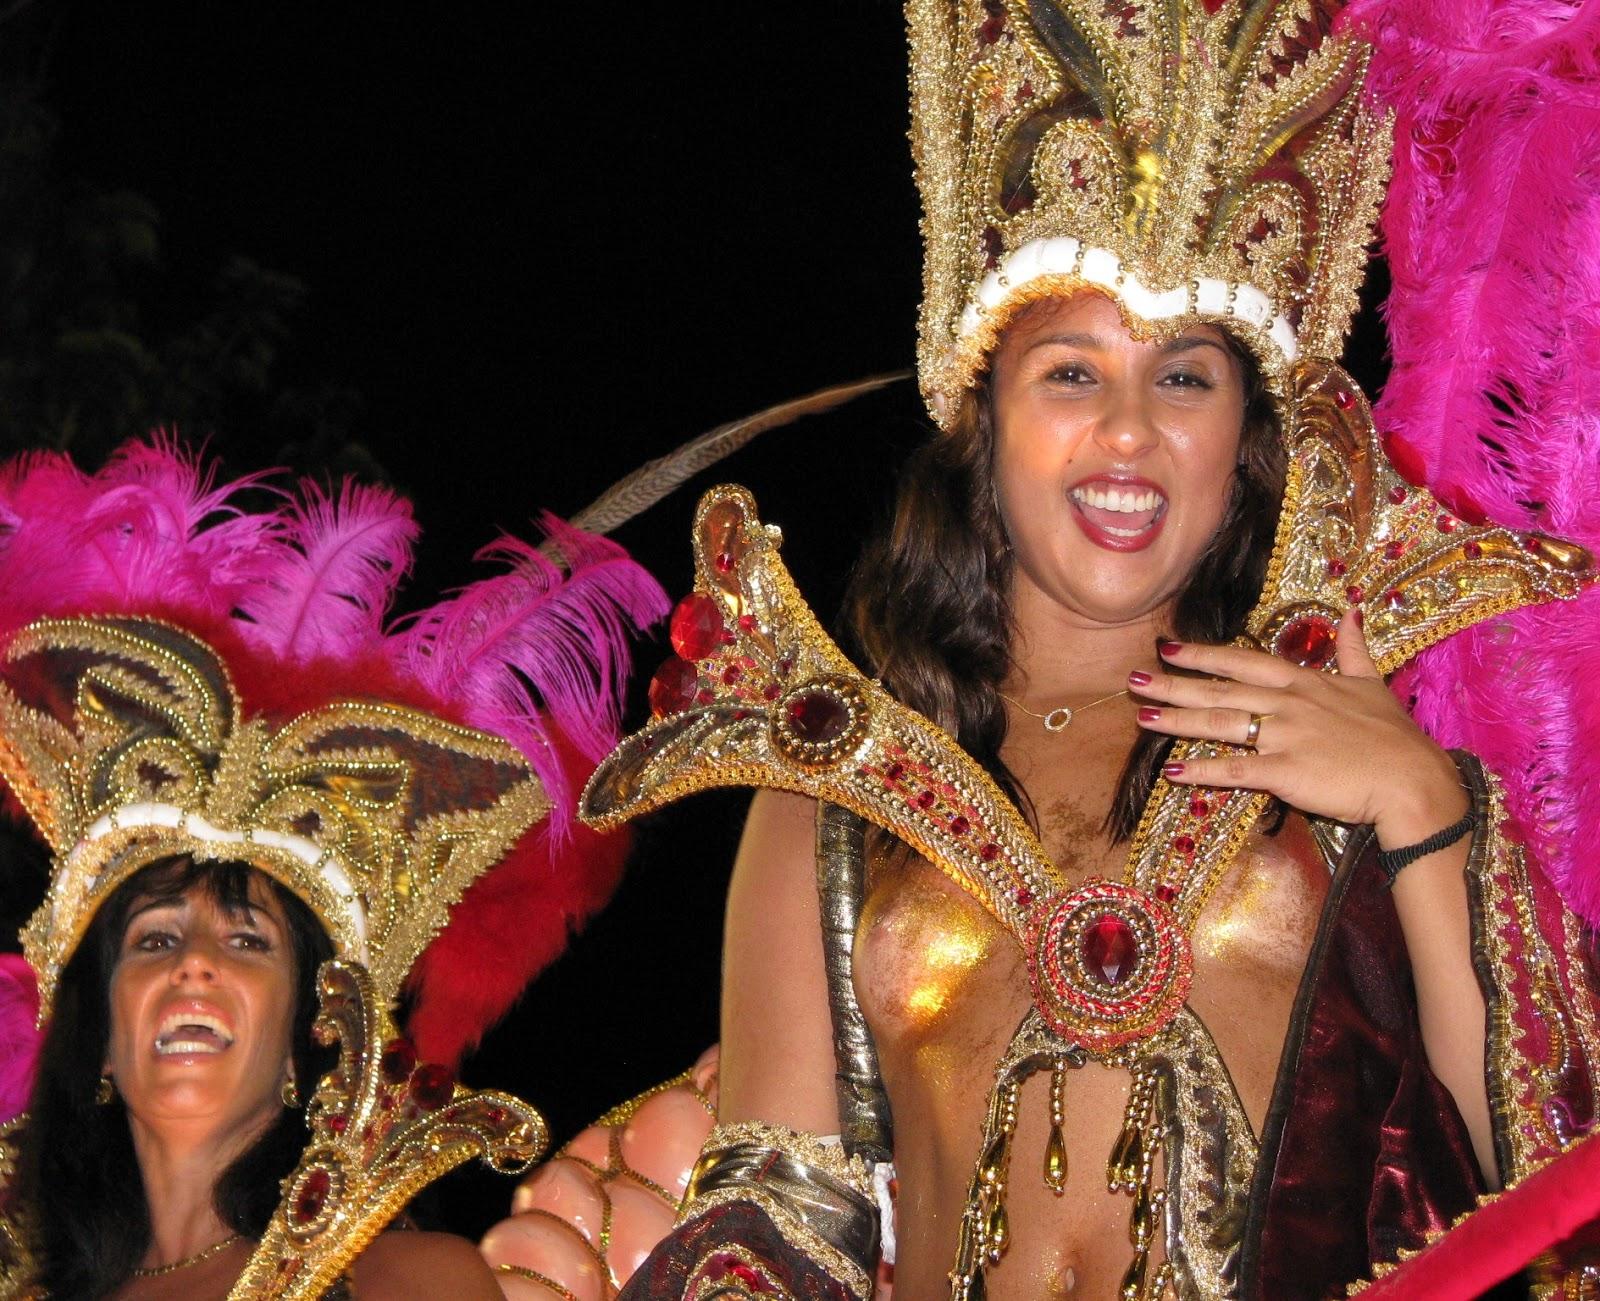 Samba Dancer - GRES Mocidade Independente de Padre Miguel - Rio de Janeiro - Carnival 2008